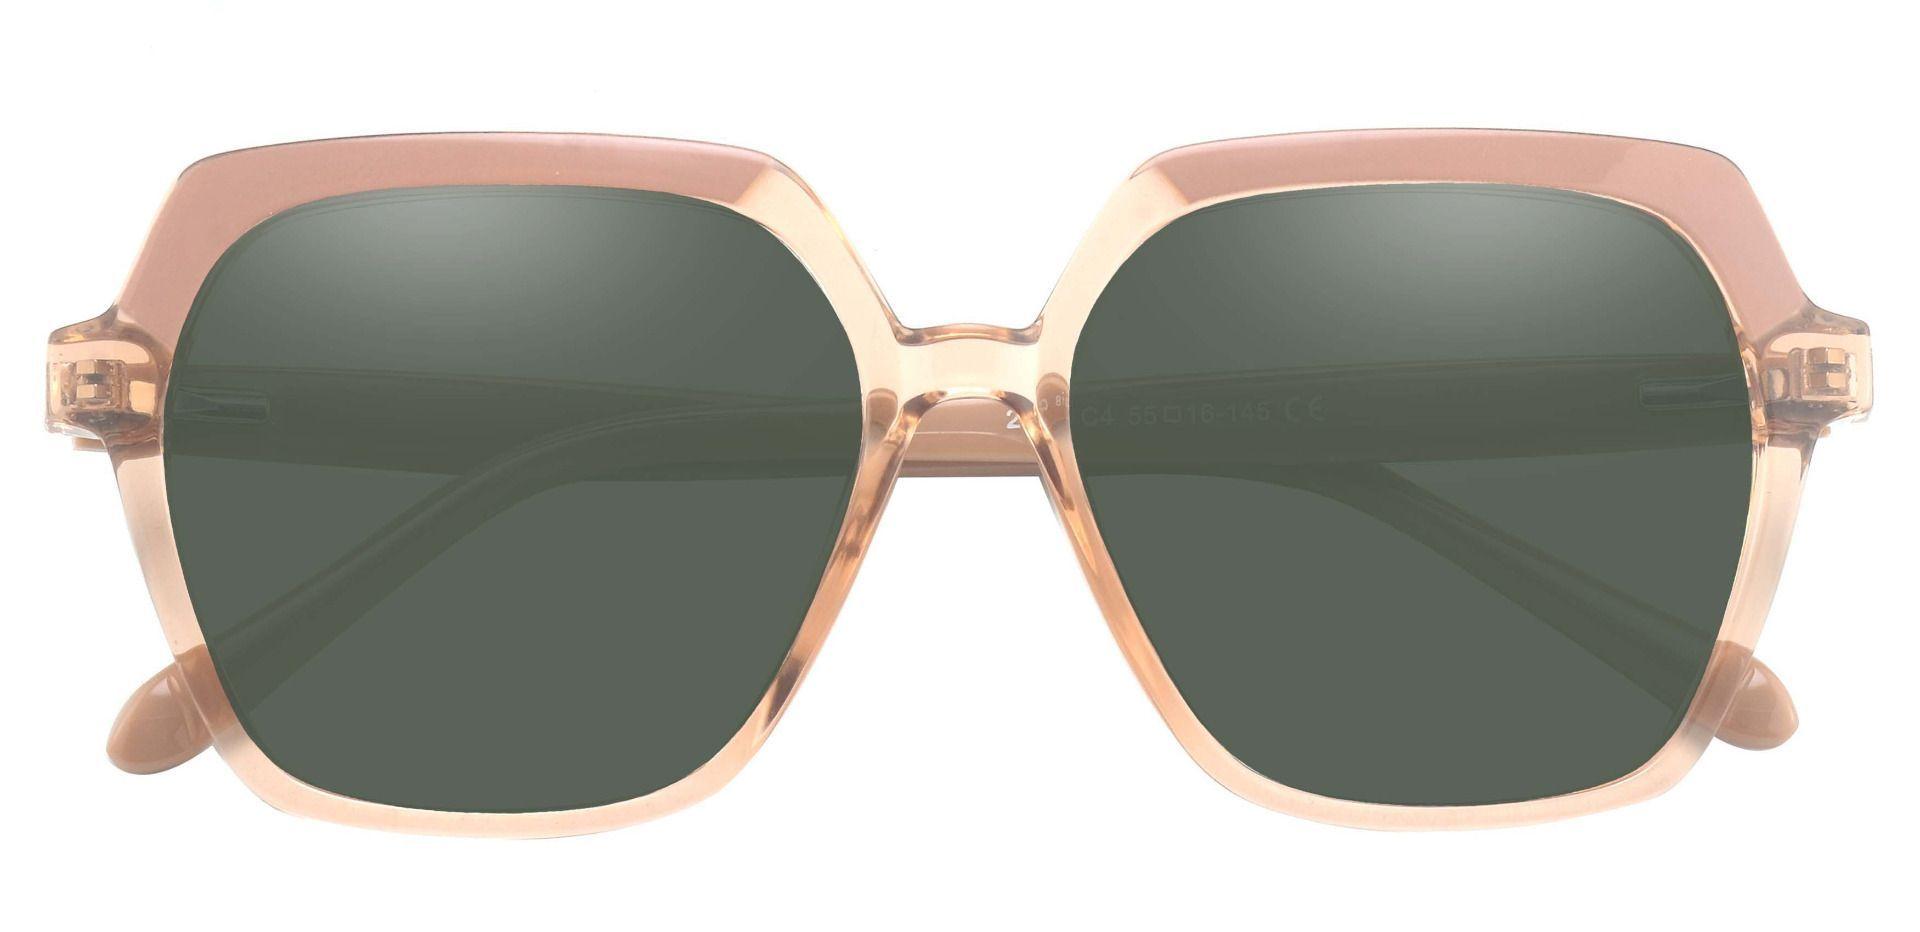 Regent Geometric Progressive Sunglasses - Brown Frame With Green Lenses